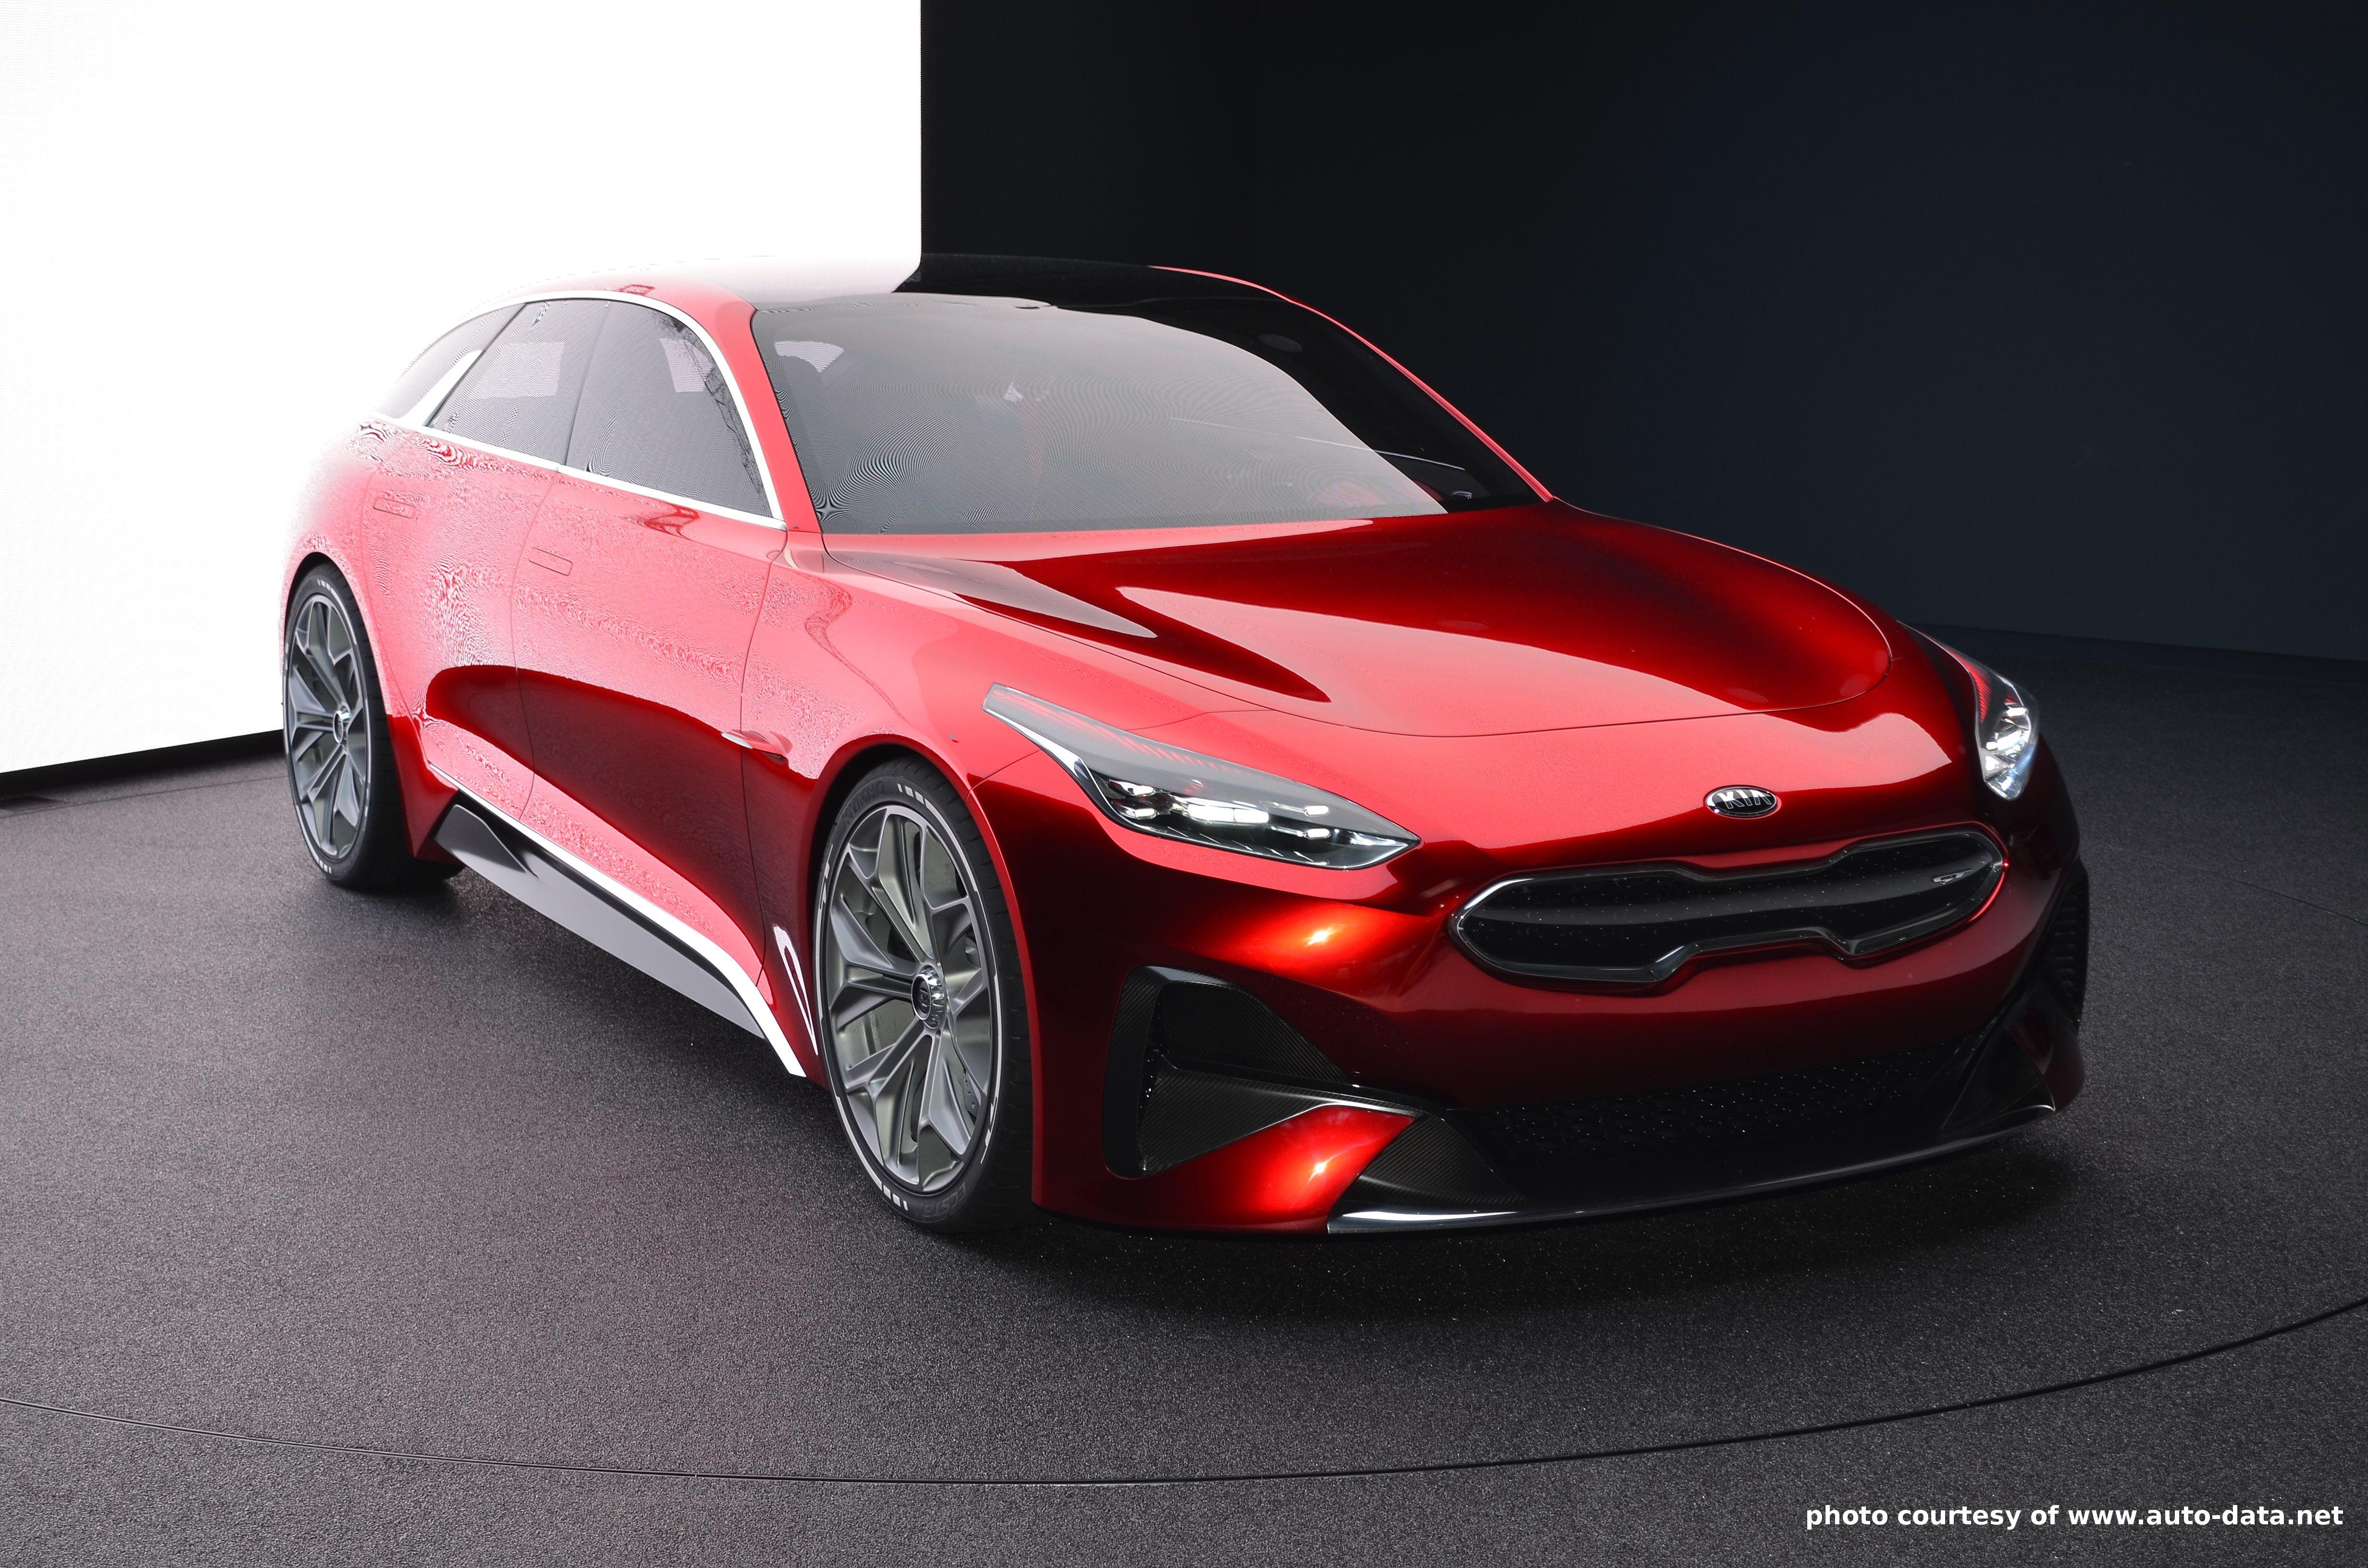 Kia Proceed Concept At The 2017 Frankfurt Motor Show Cool Cars Tyre Size Car Kia proceed concept frankfurt motor show